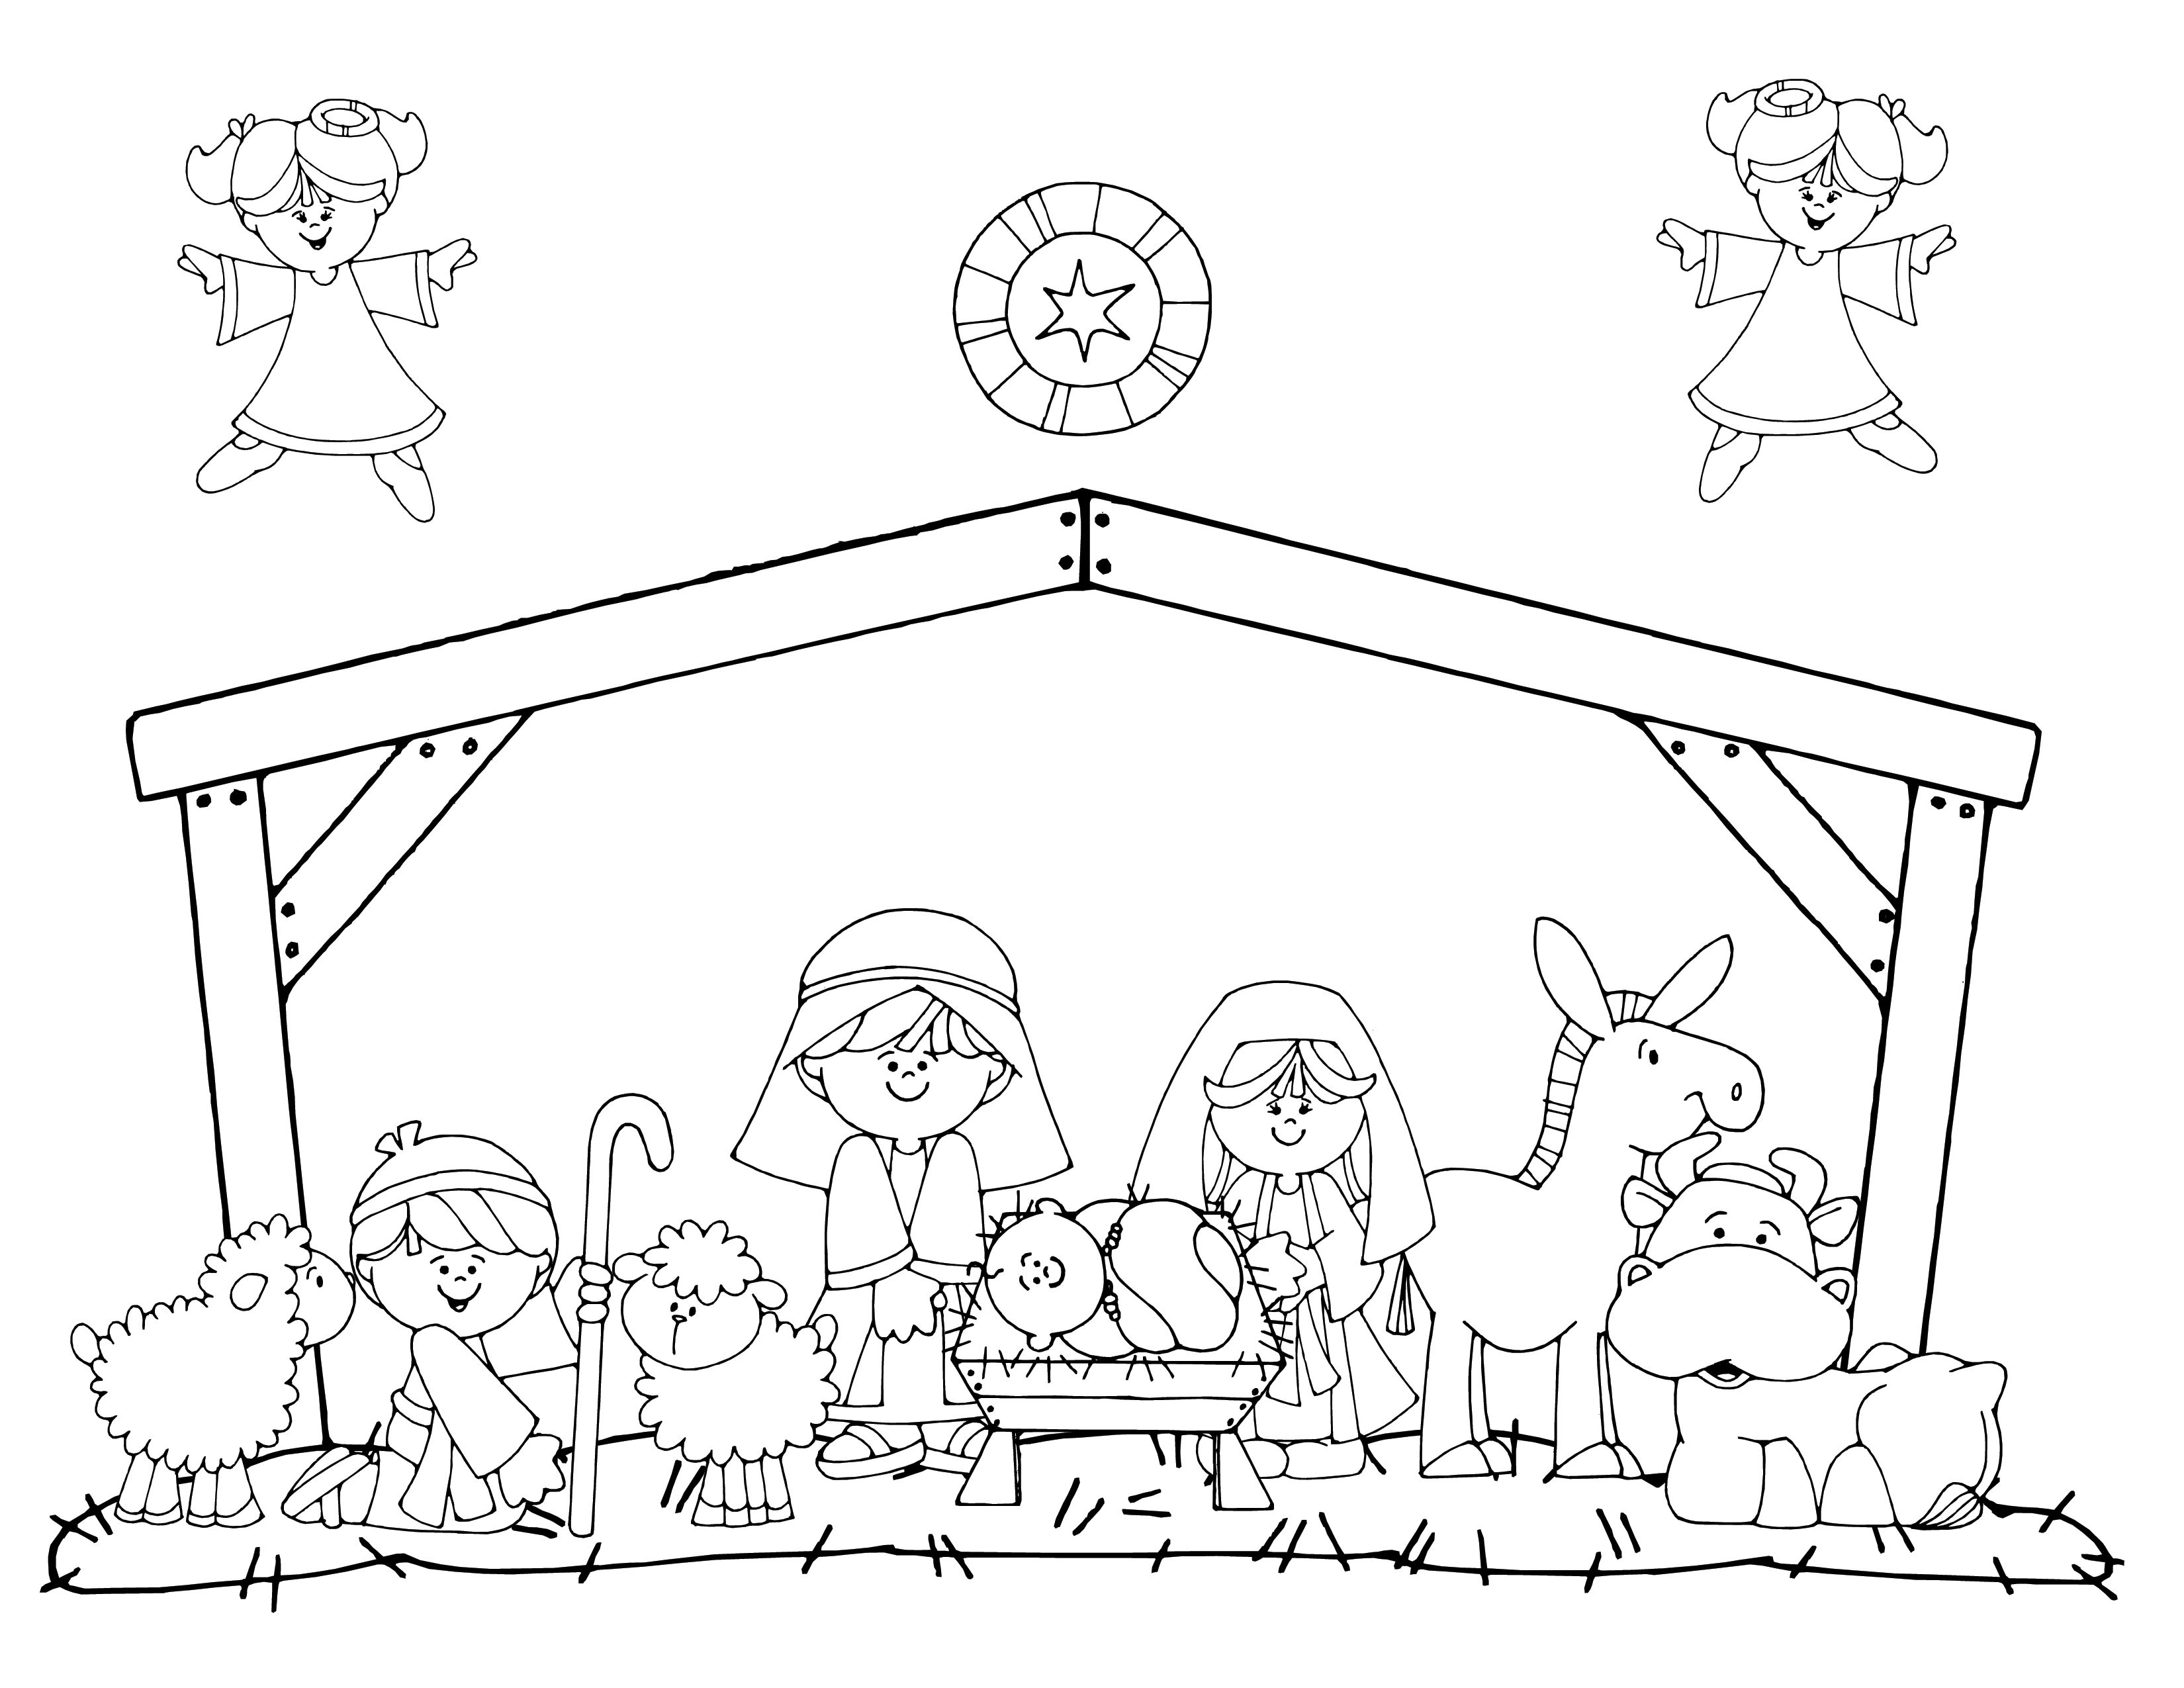 Dibujos Navidenos Para Colorear Buscar Con Google Nativity Coloring Pages Nativity Coloring Christmas Coloring Pages